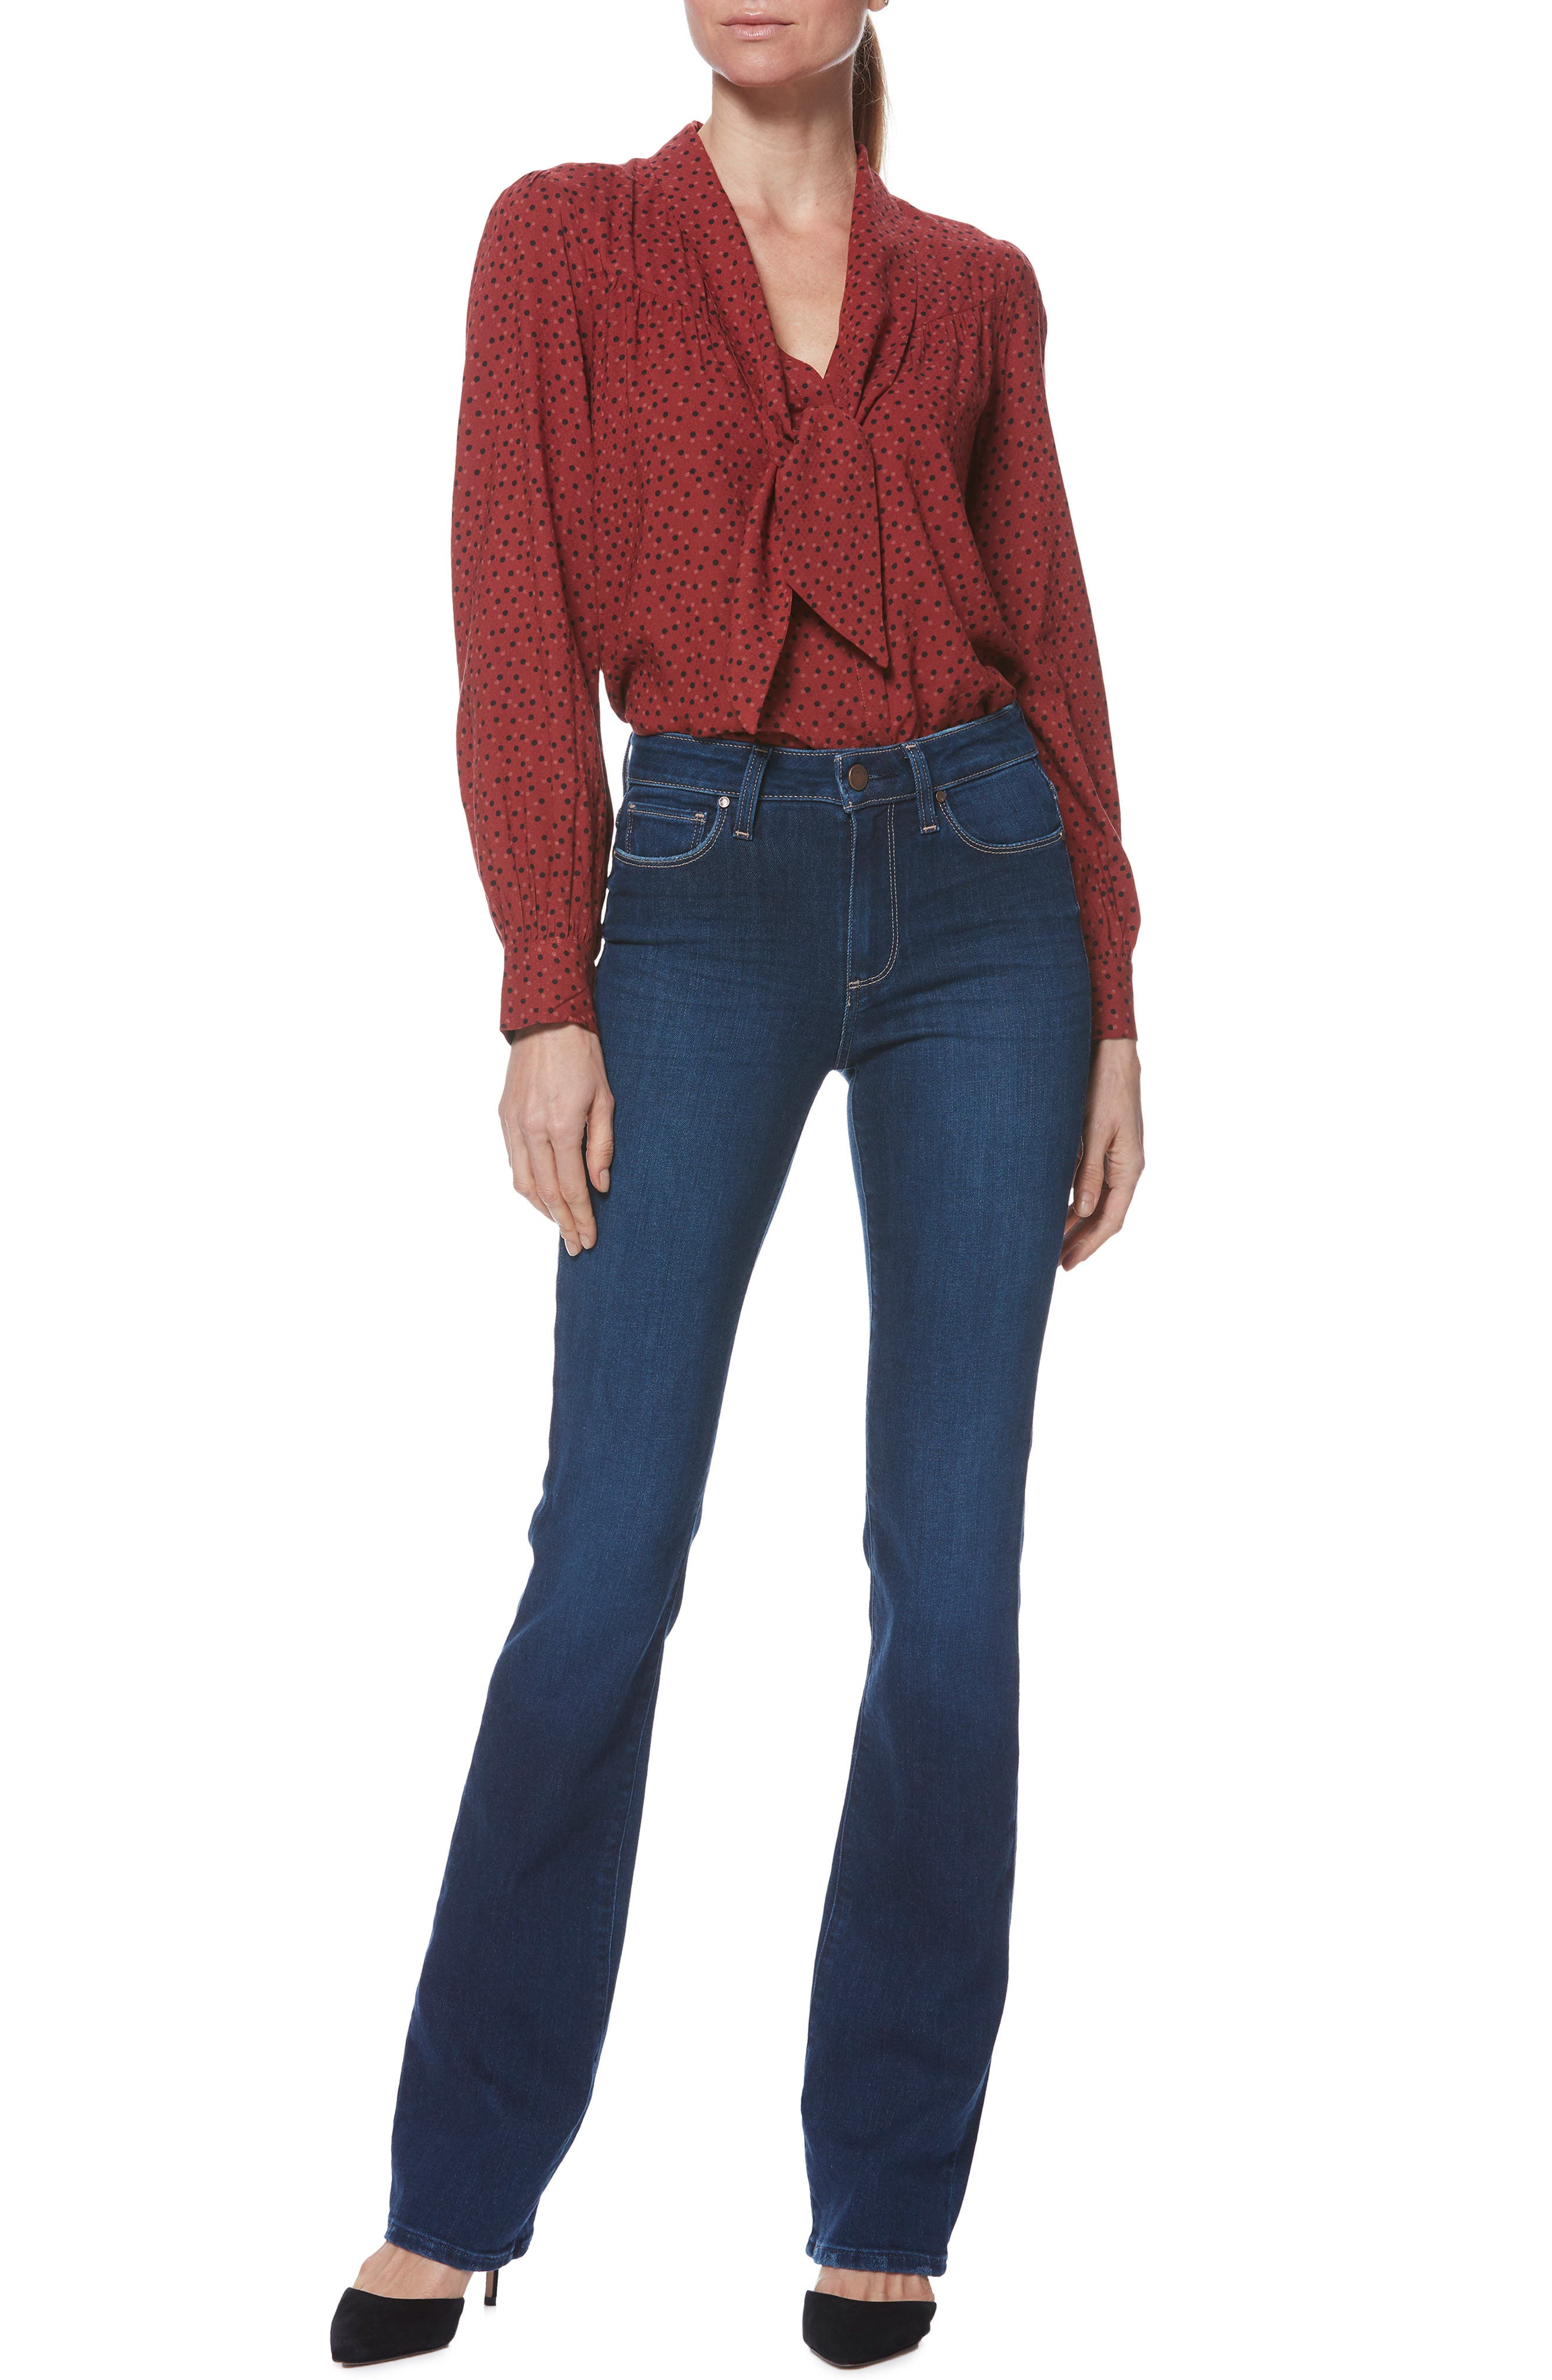 Transcend Vintage - Manhattan Bootcut Jeans,                             Alternate thumbnail 7, color,                             POMPEII